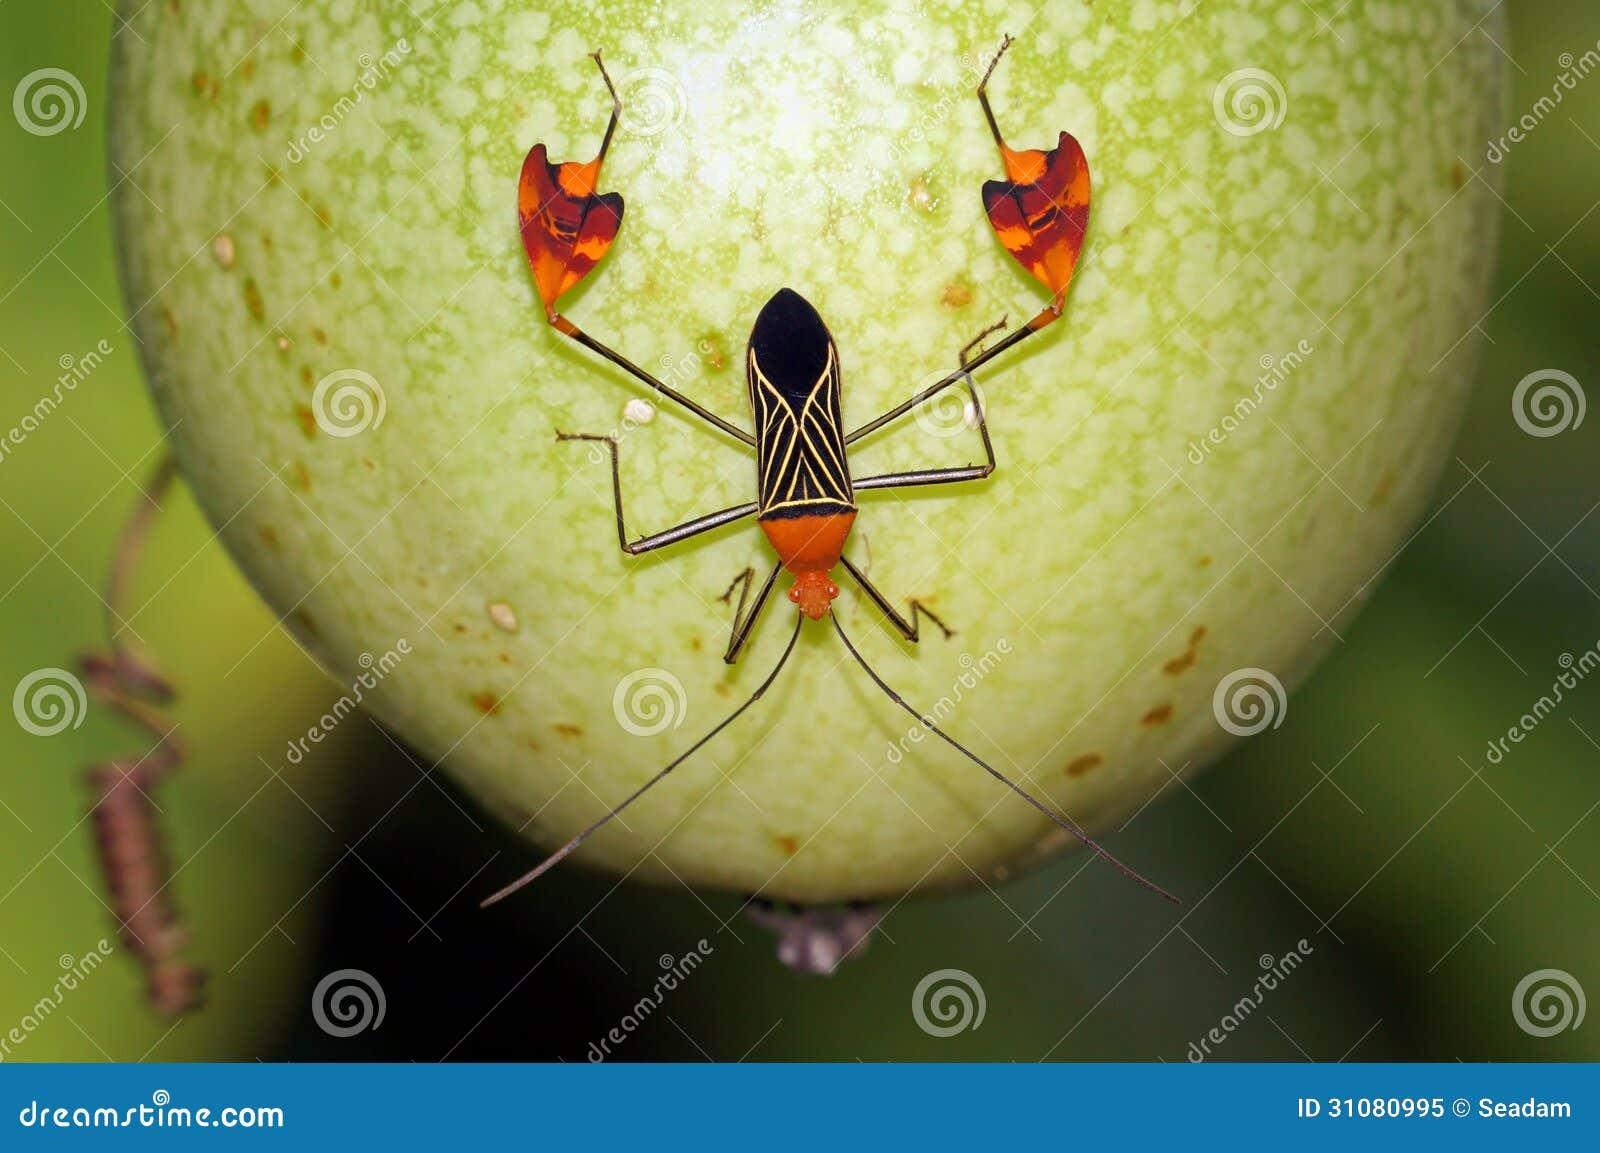 Leaf-footed Bug Anisoscelis Flavolineata Royalty Free Stock Photo ...